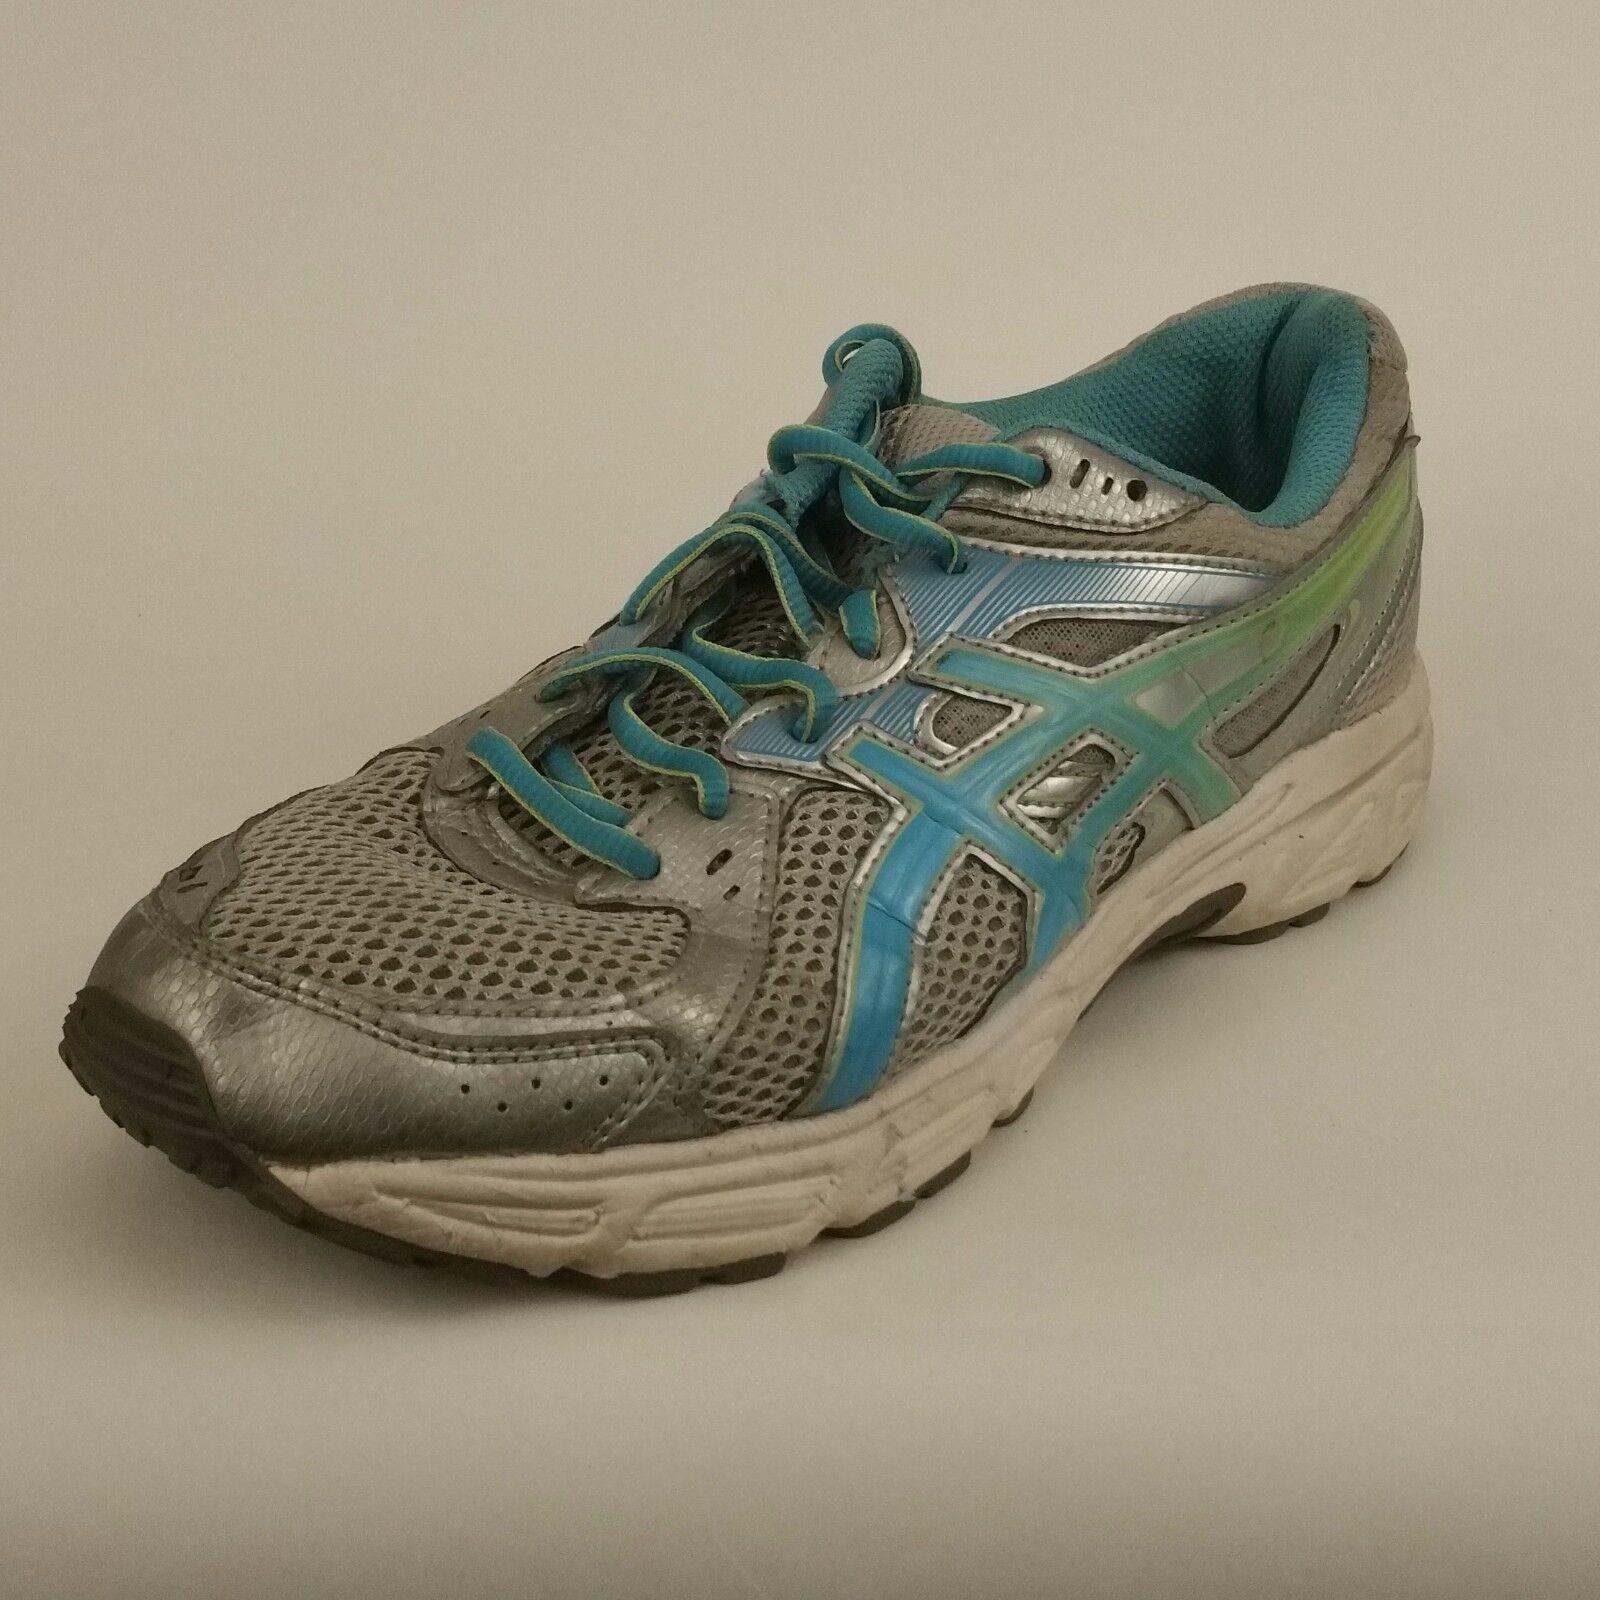 Asics Women's Gel-Contend 2 Running Shoes T475Q Comfortable Seasonal price cuts, discount benefits